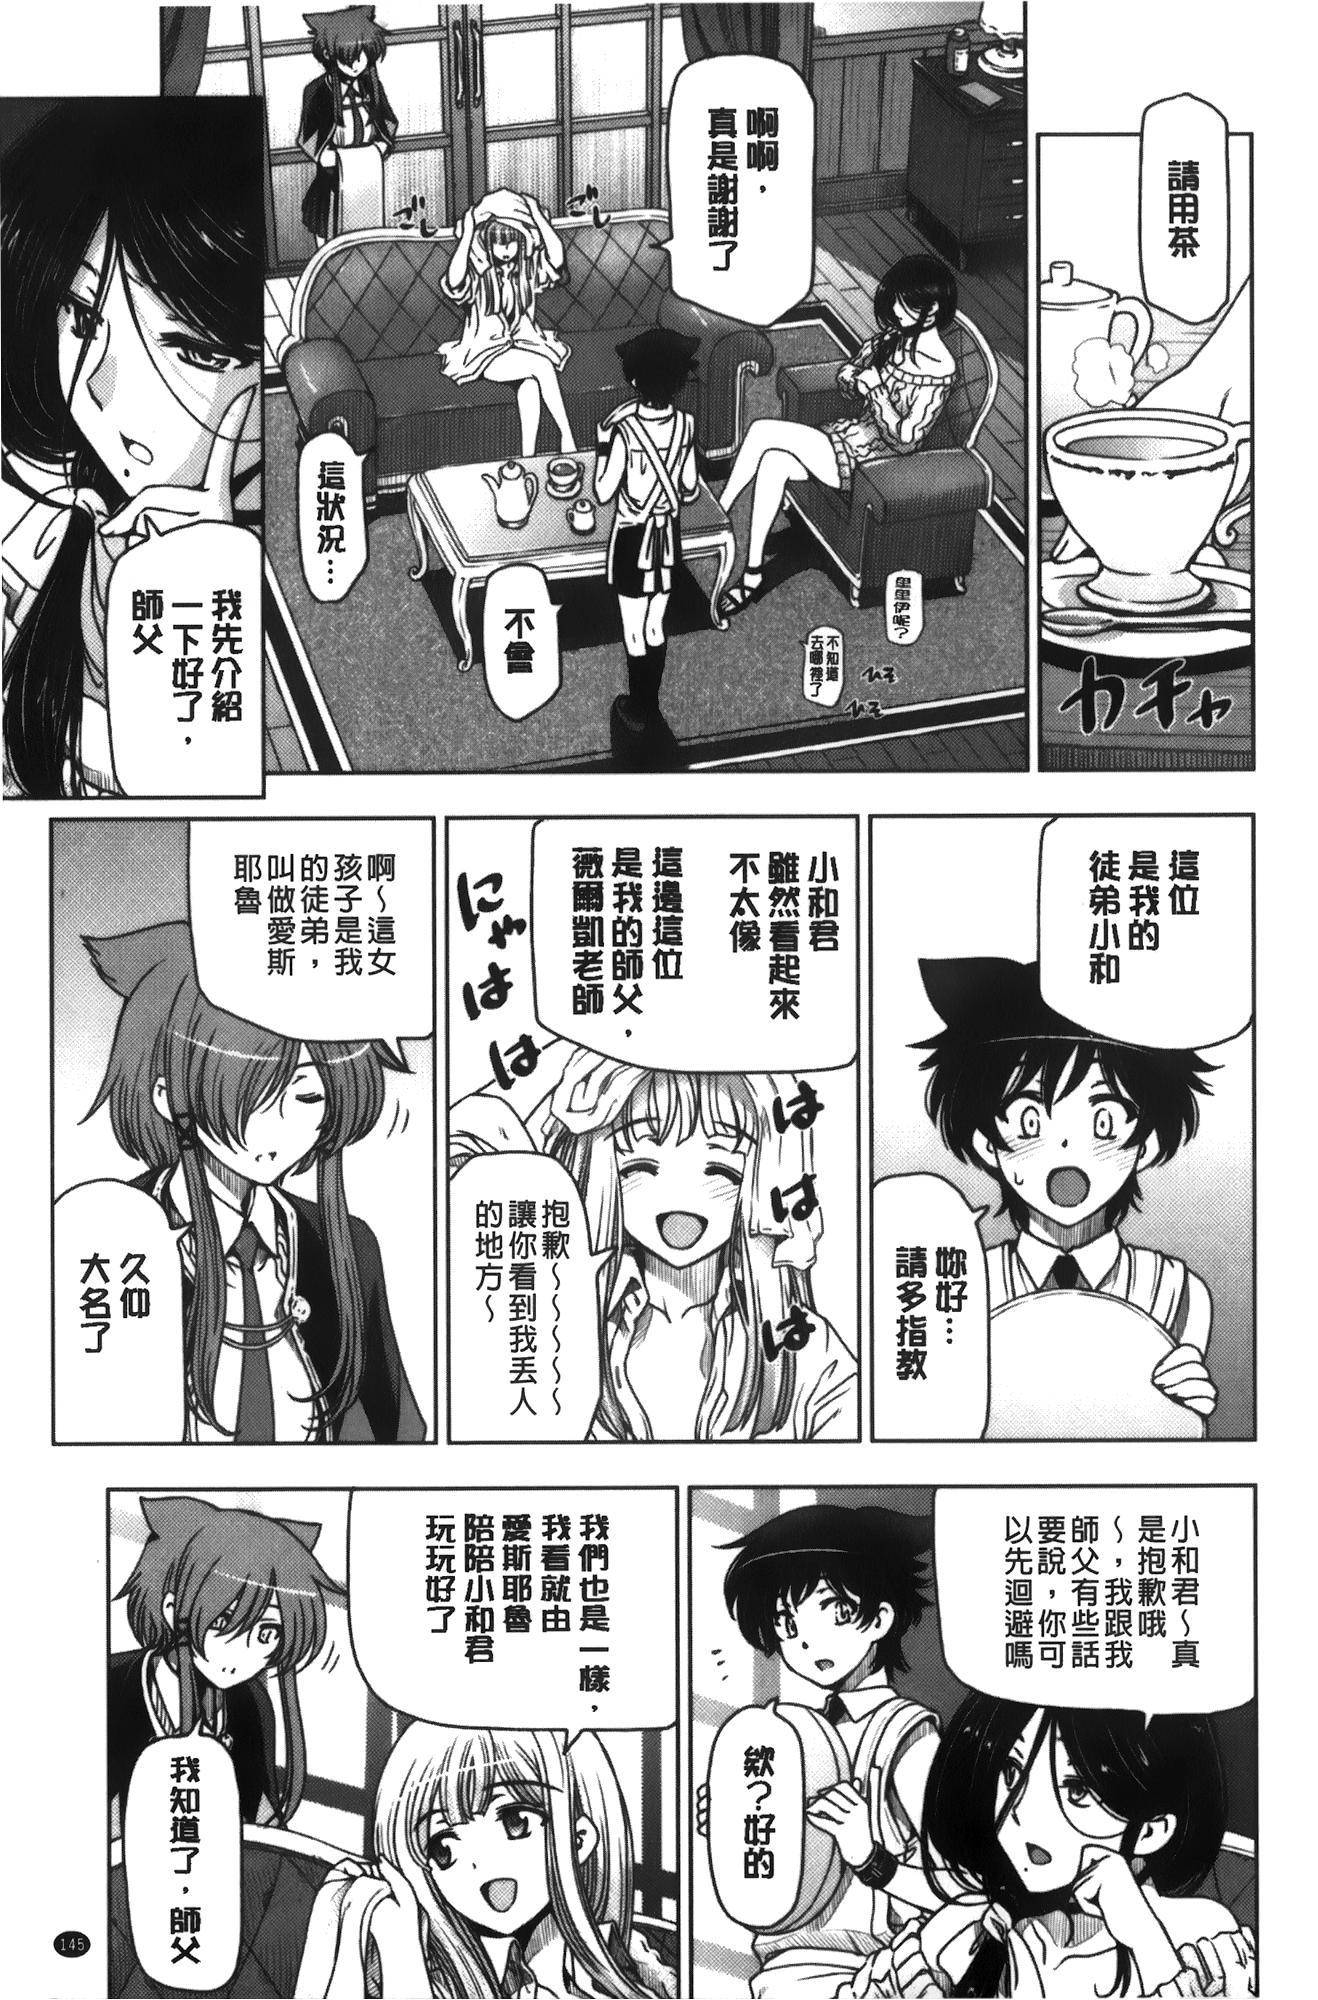 Majo × Shota ~ Genteiban | 魔女X小正太 限定版 153